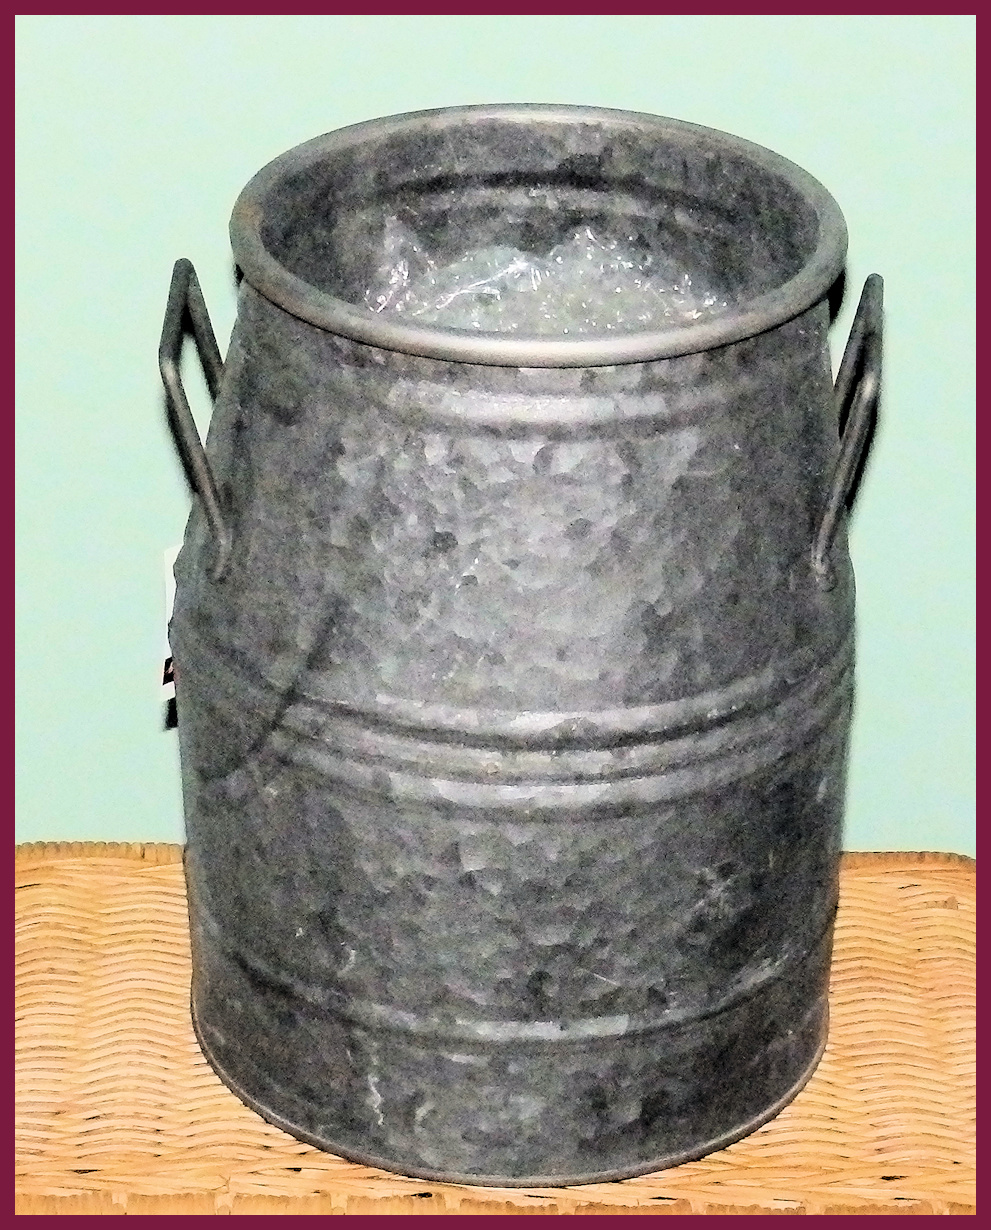 metal-milk-can-galvanized-8t1305.jpg